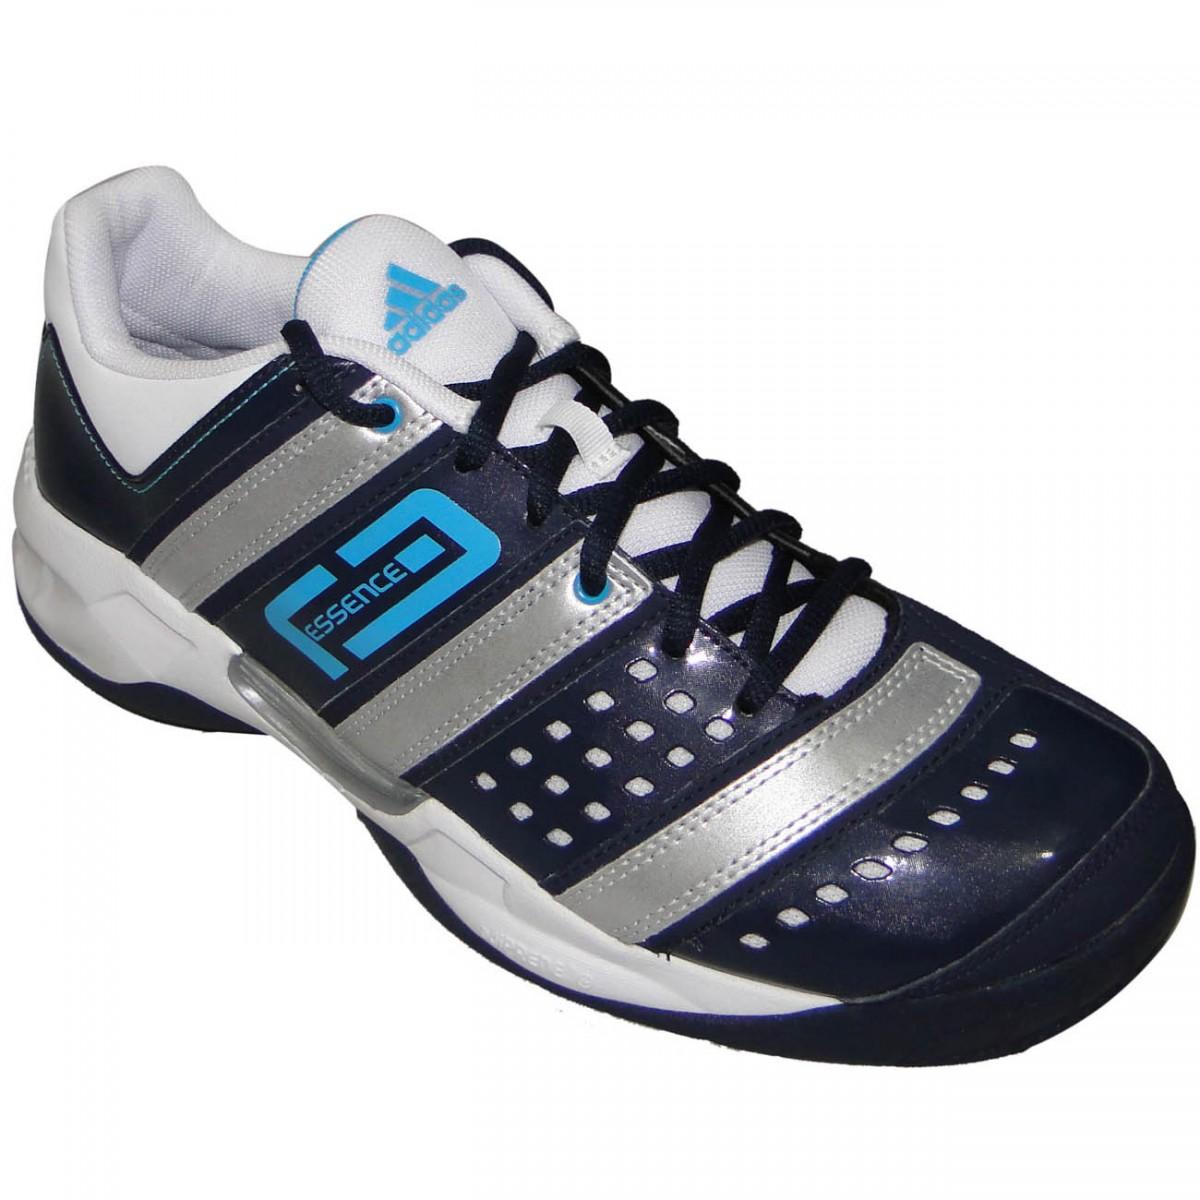 a709681a224 TENIS ADIDAS STABIL ESSENCE 5604 - MARINHO BRANCO - Chuteira Nike ...